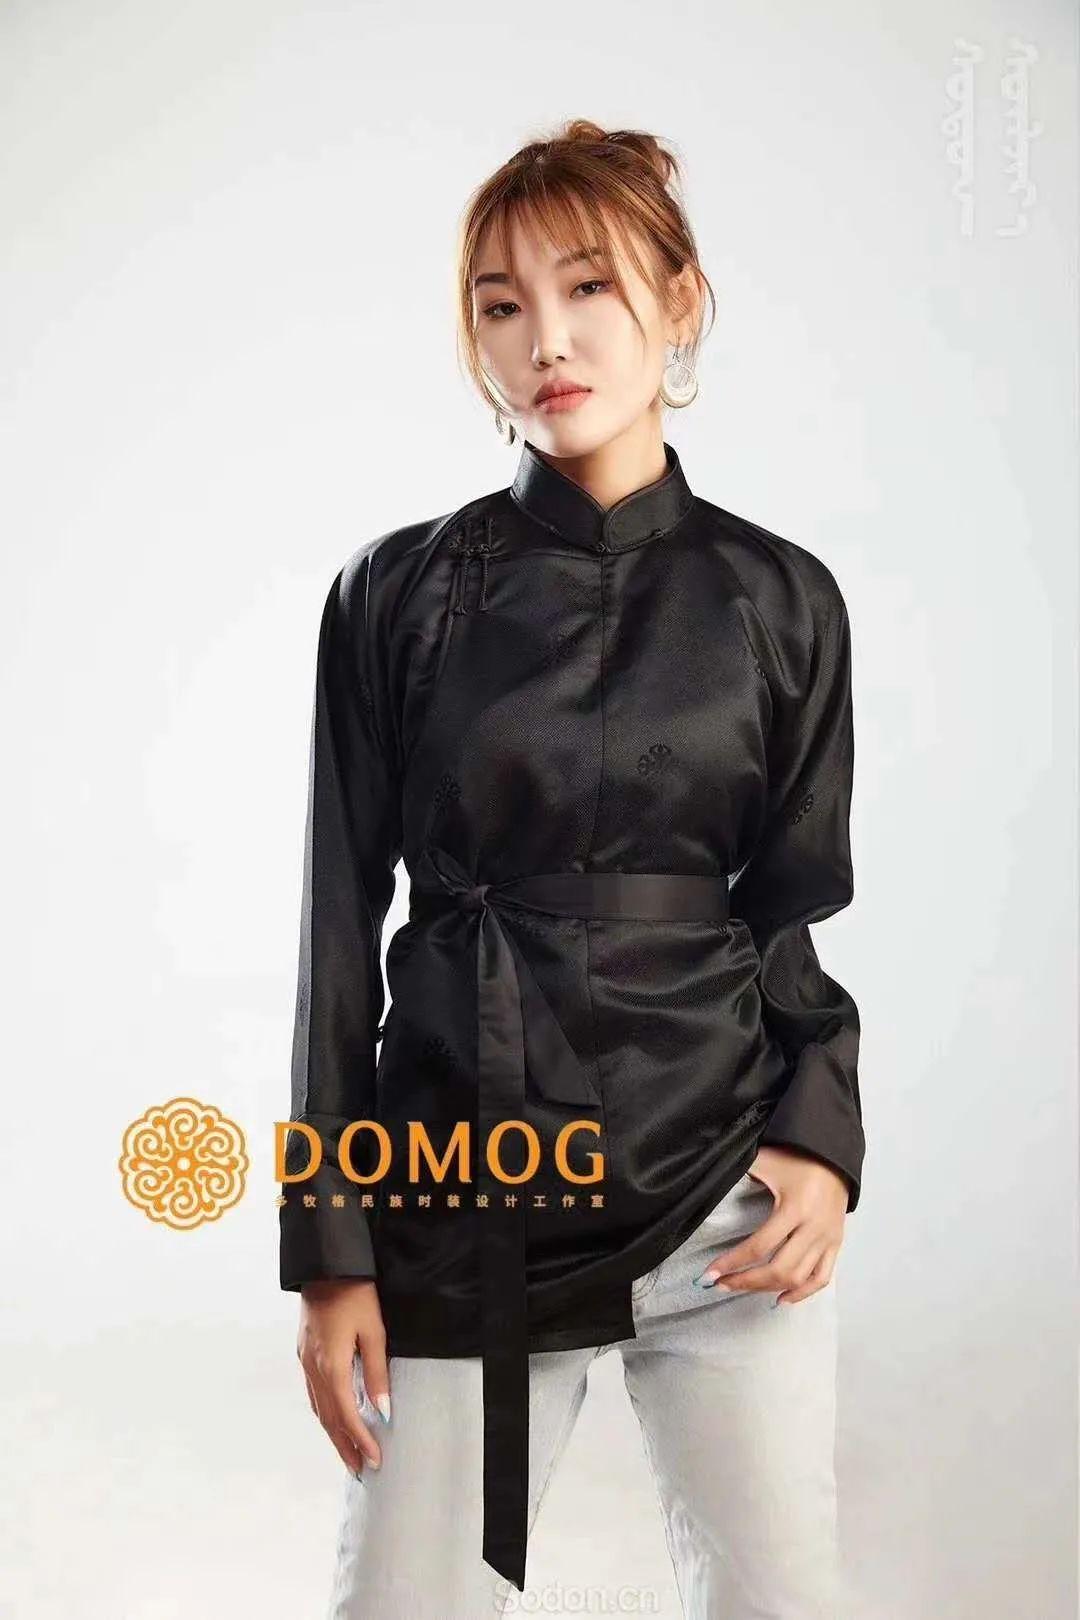 DOMOG 蒙古时装2020新款,民族与时尚的融合 第42张 DOMOG 蒙古时装2020新款,民族与时尚的融合 蒙古服饰